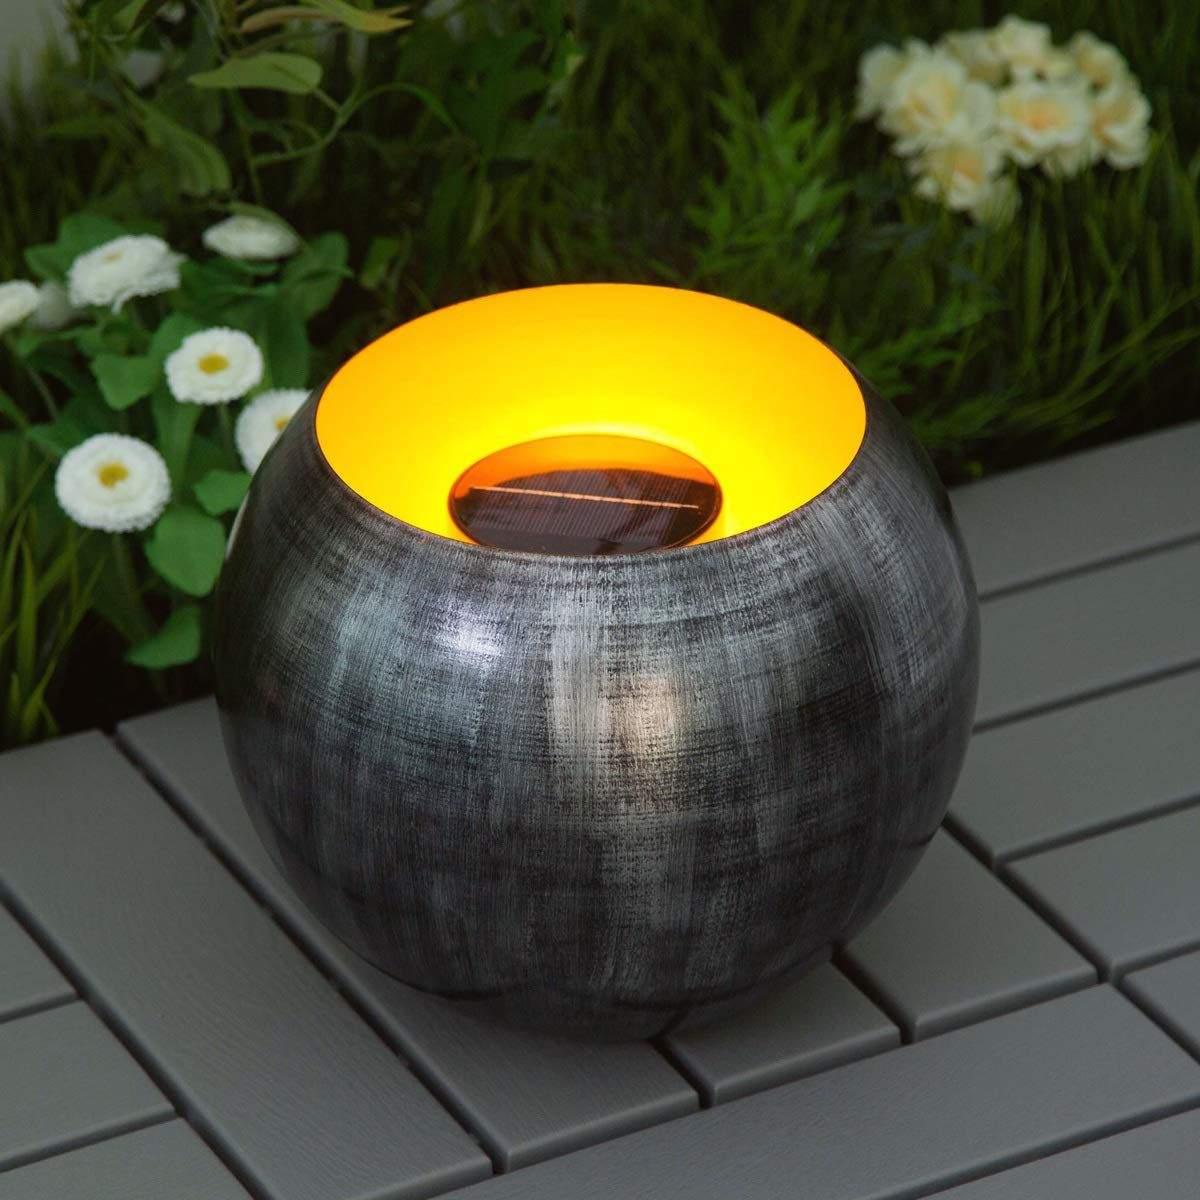 31 Genial Beleuchtung Garten Led Luxus Garten Anlegen